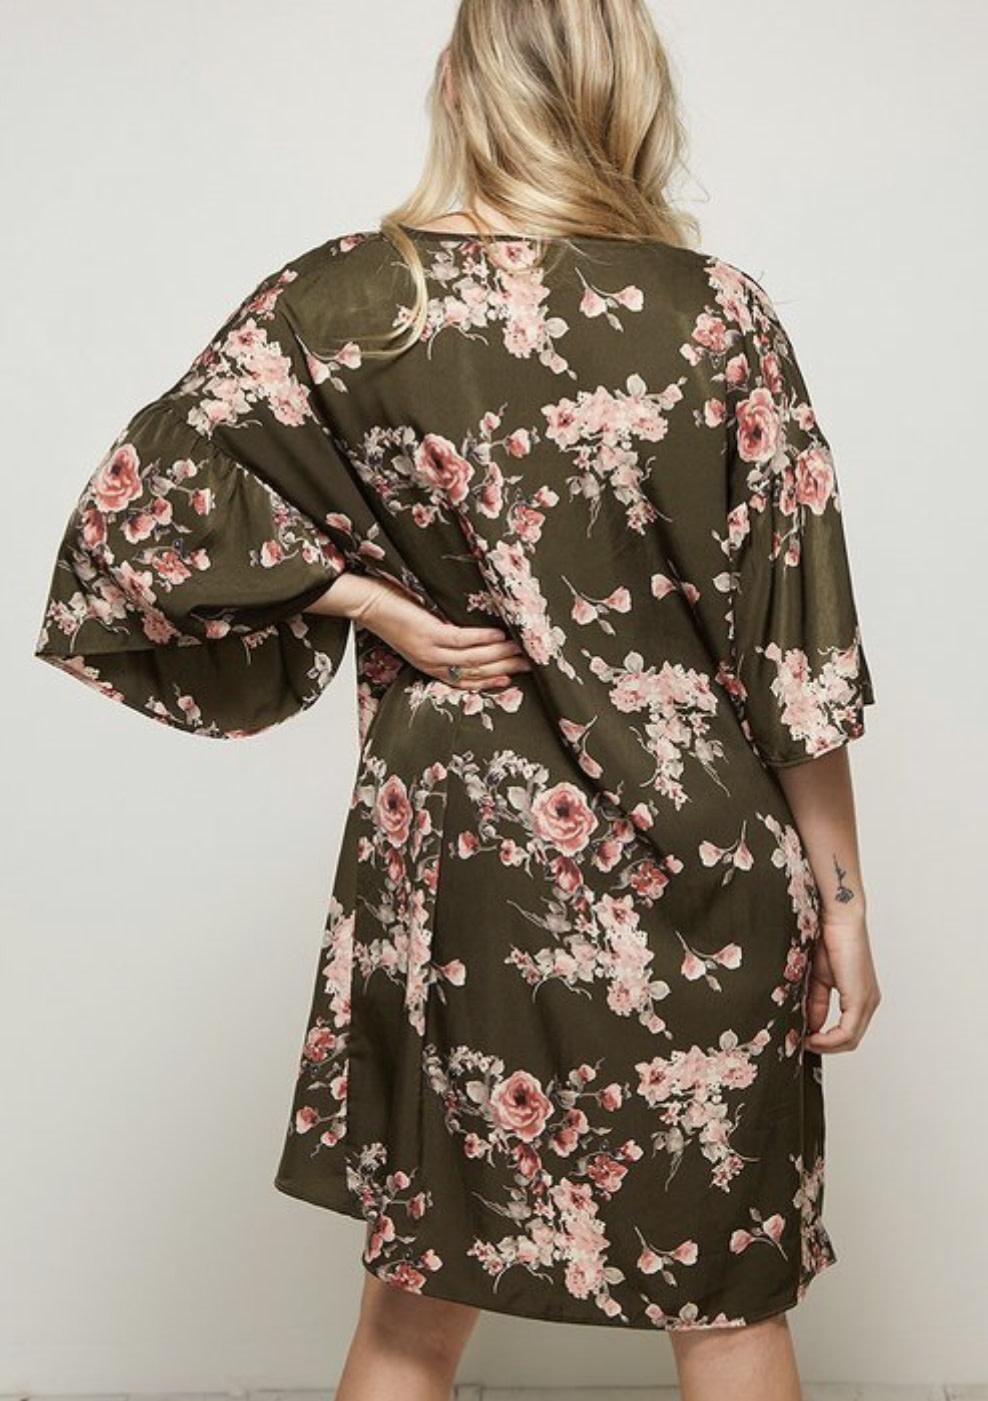 Olive Floral Cover-up